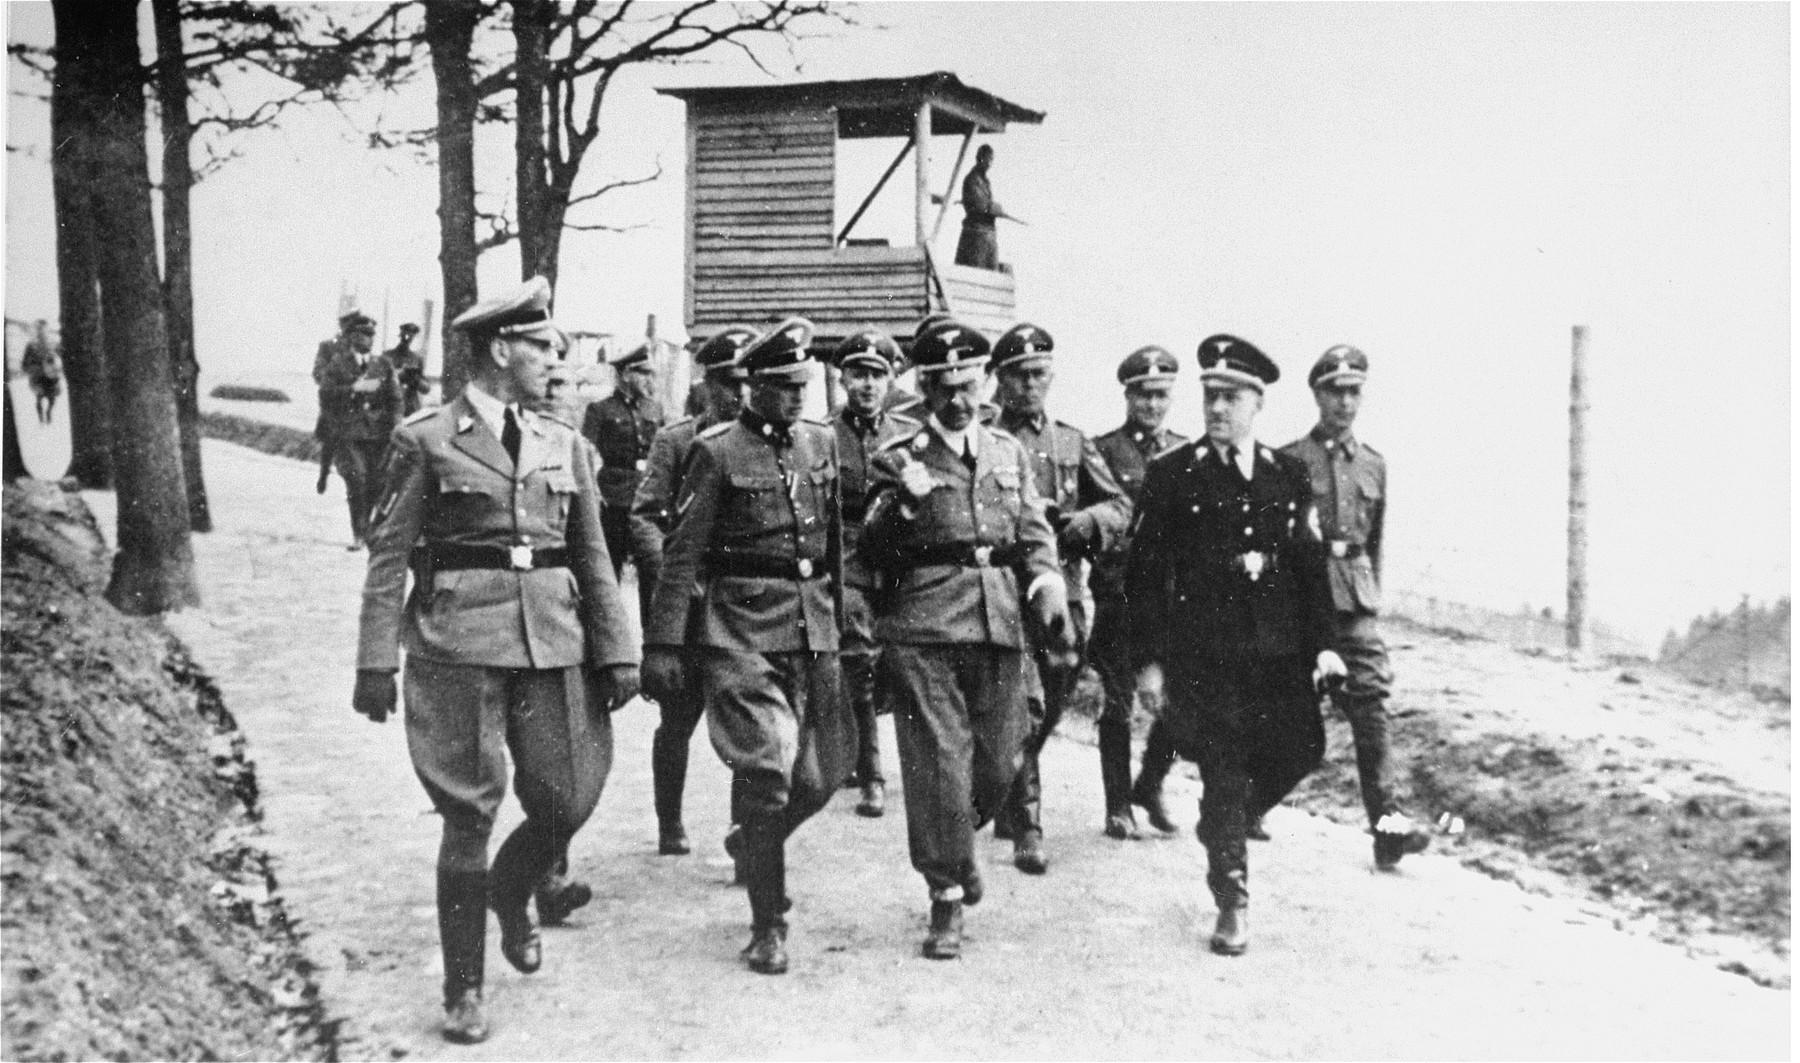 https://upload.wikimedia.org/wikipedia/commons/1/1e/Bundesarchiv_Bild_183-45534-0005,_Kz_Mauthausen,_Besuch_Heinrich_Himmler,_Franz_Ziereis.jpg